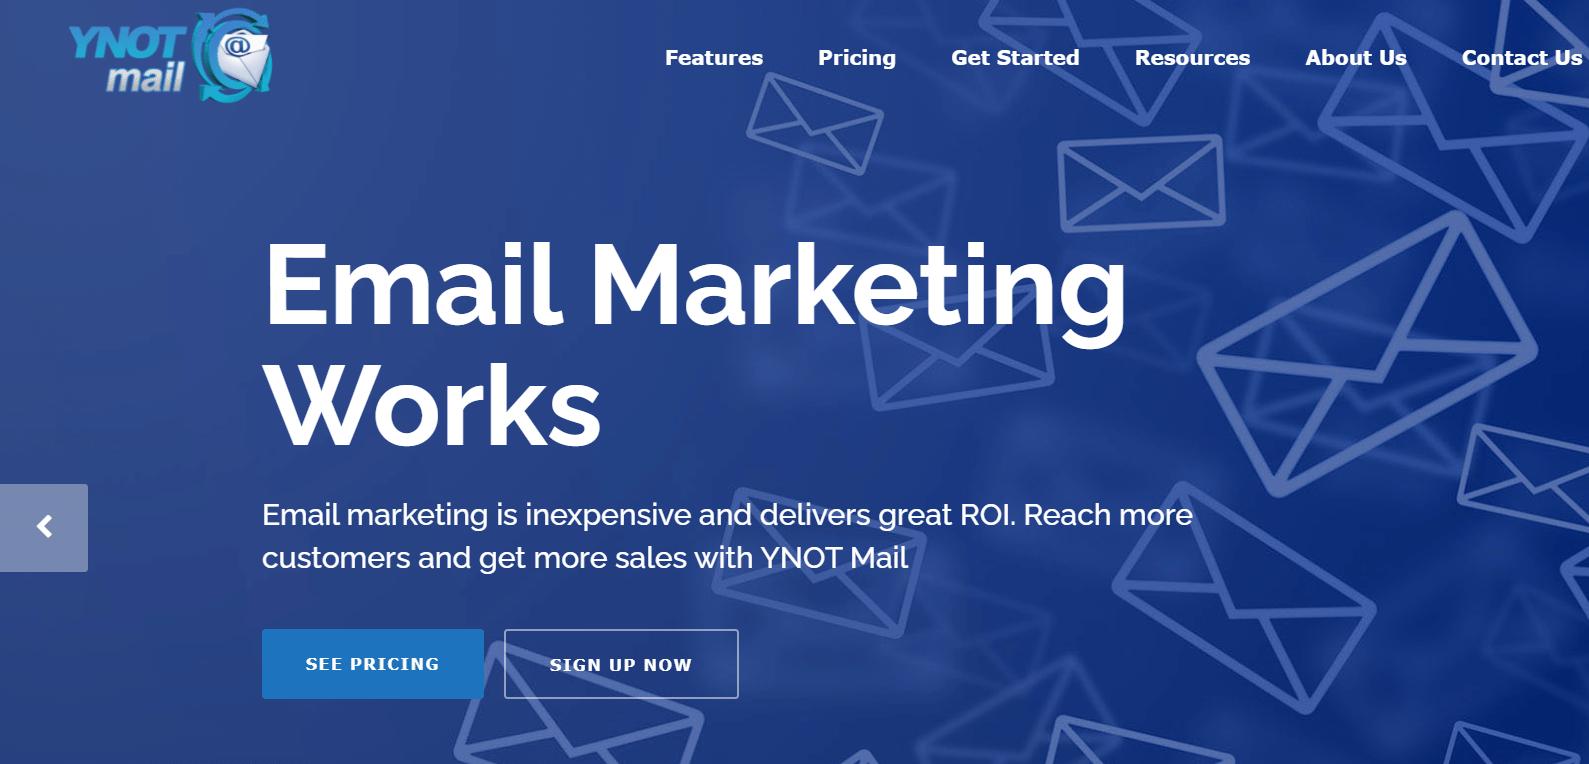 , ynotmail-成人邮件营销服务商